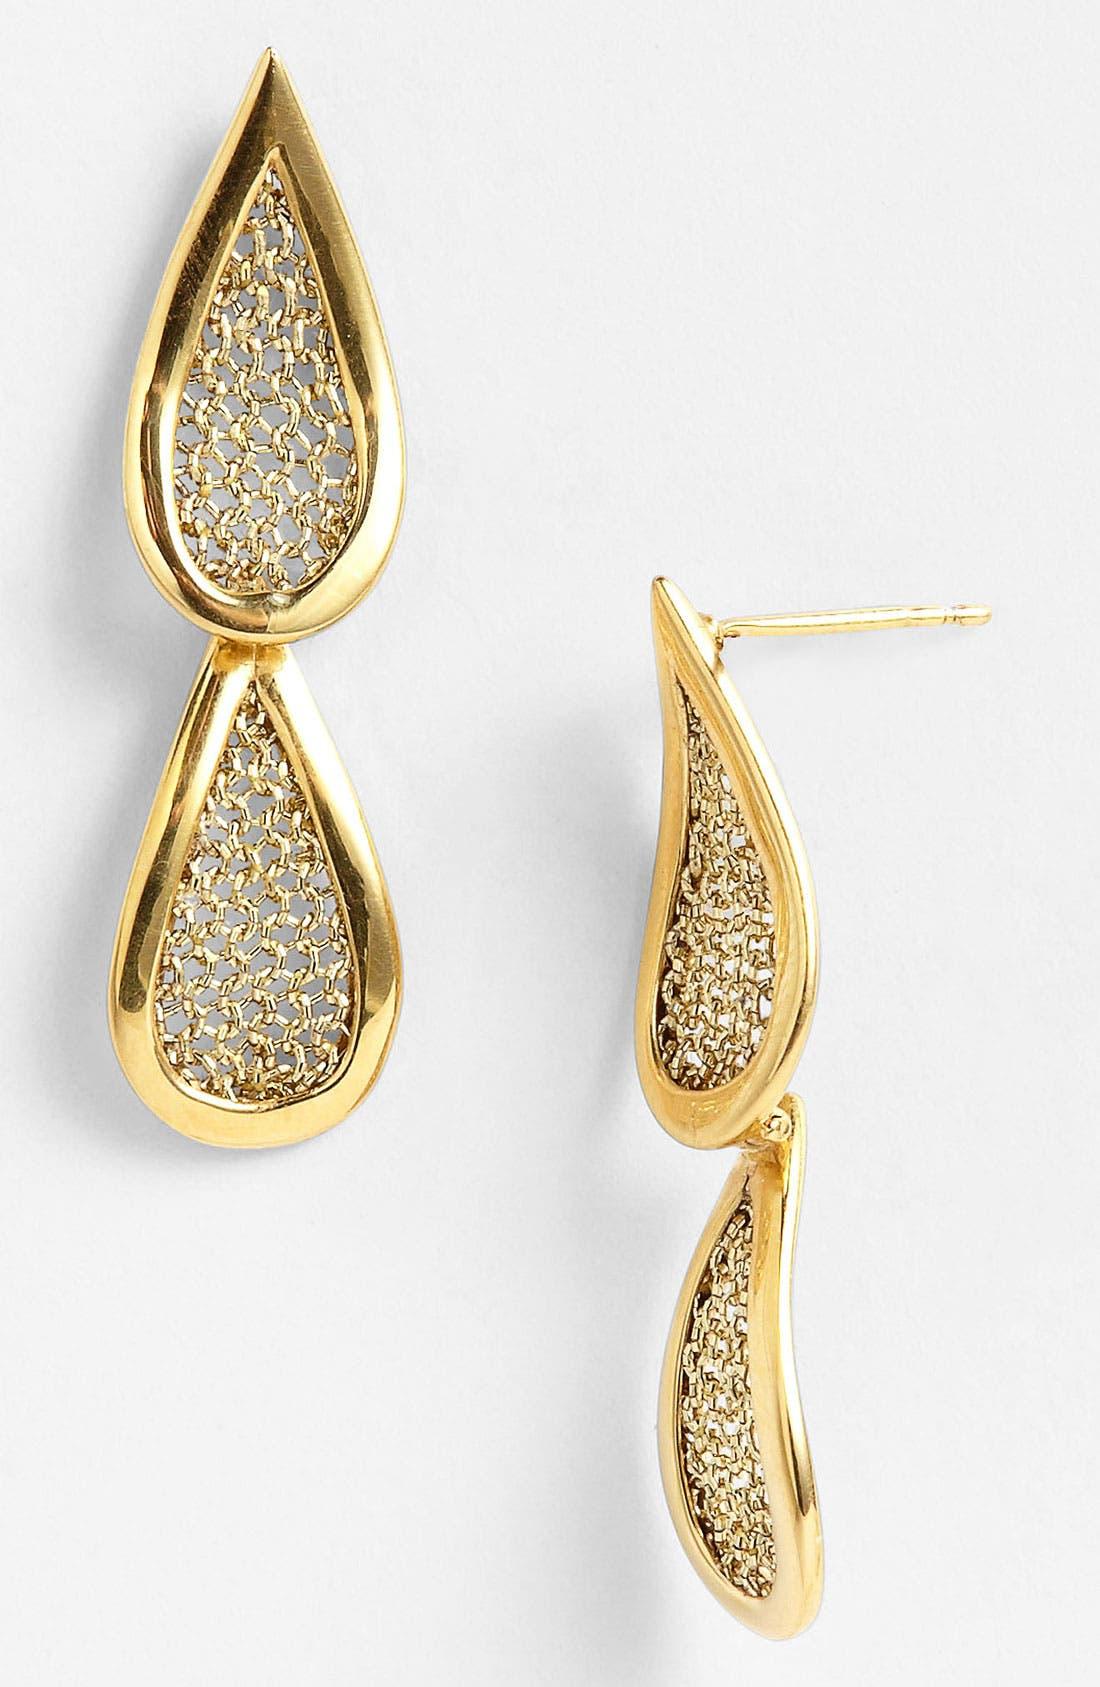 Main Image - Adami & Martucci 'Mesh' Drop Earrings (Nordstrom Exclusive)